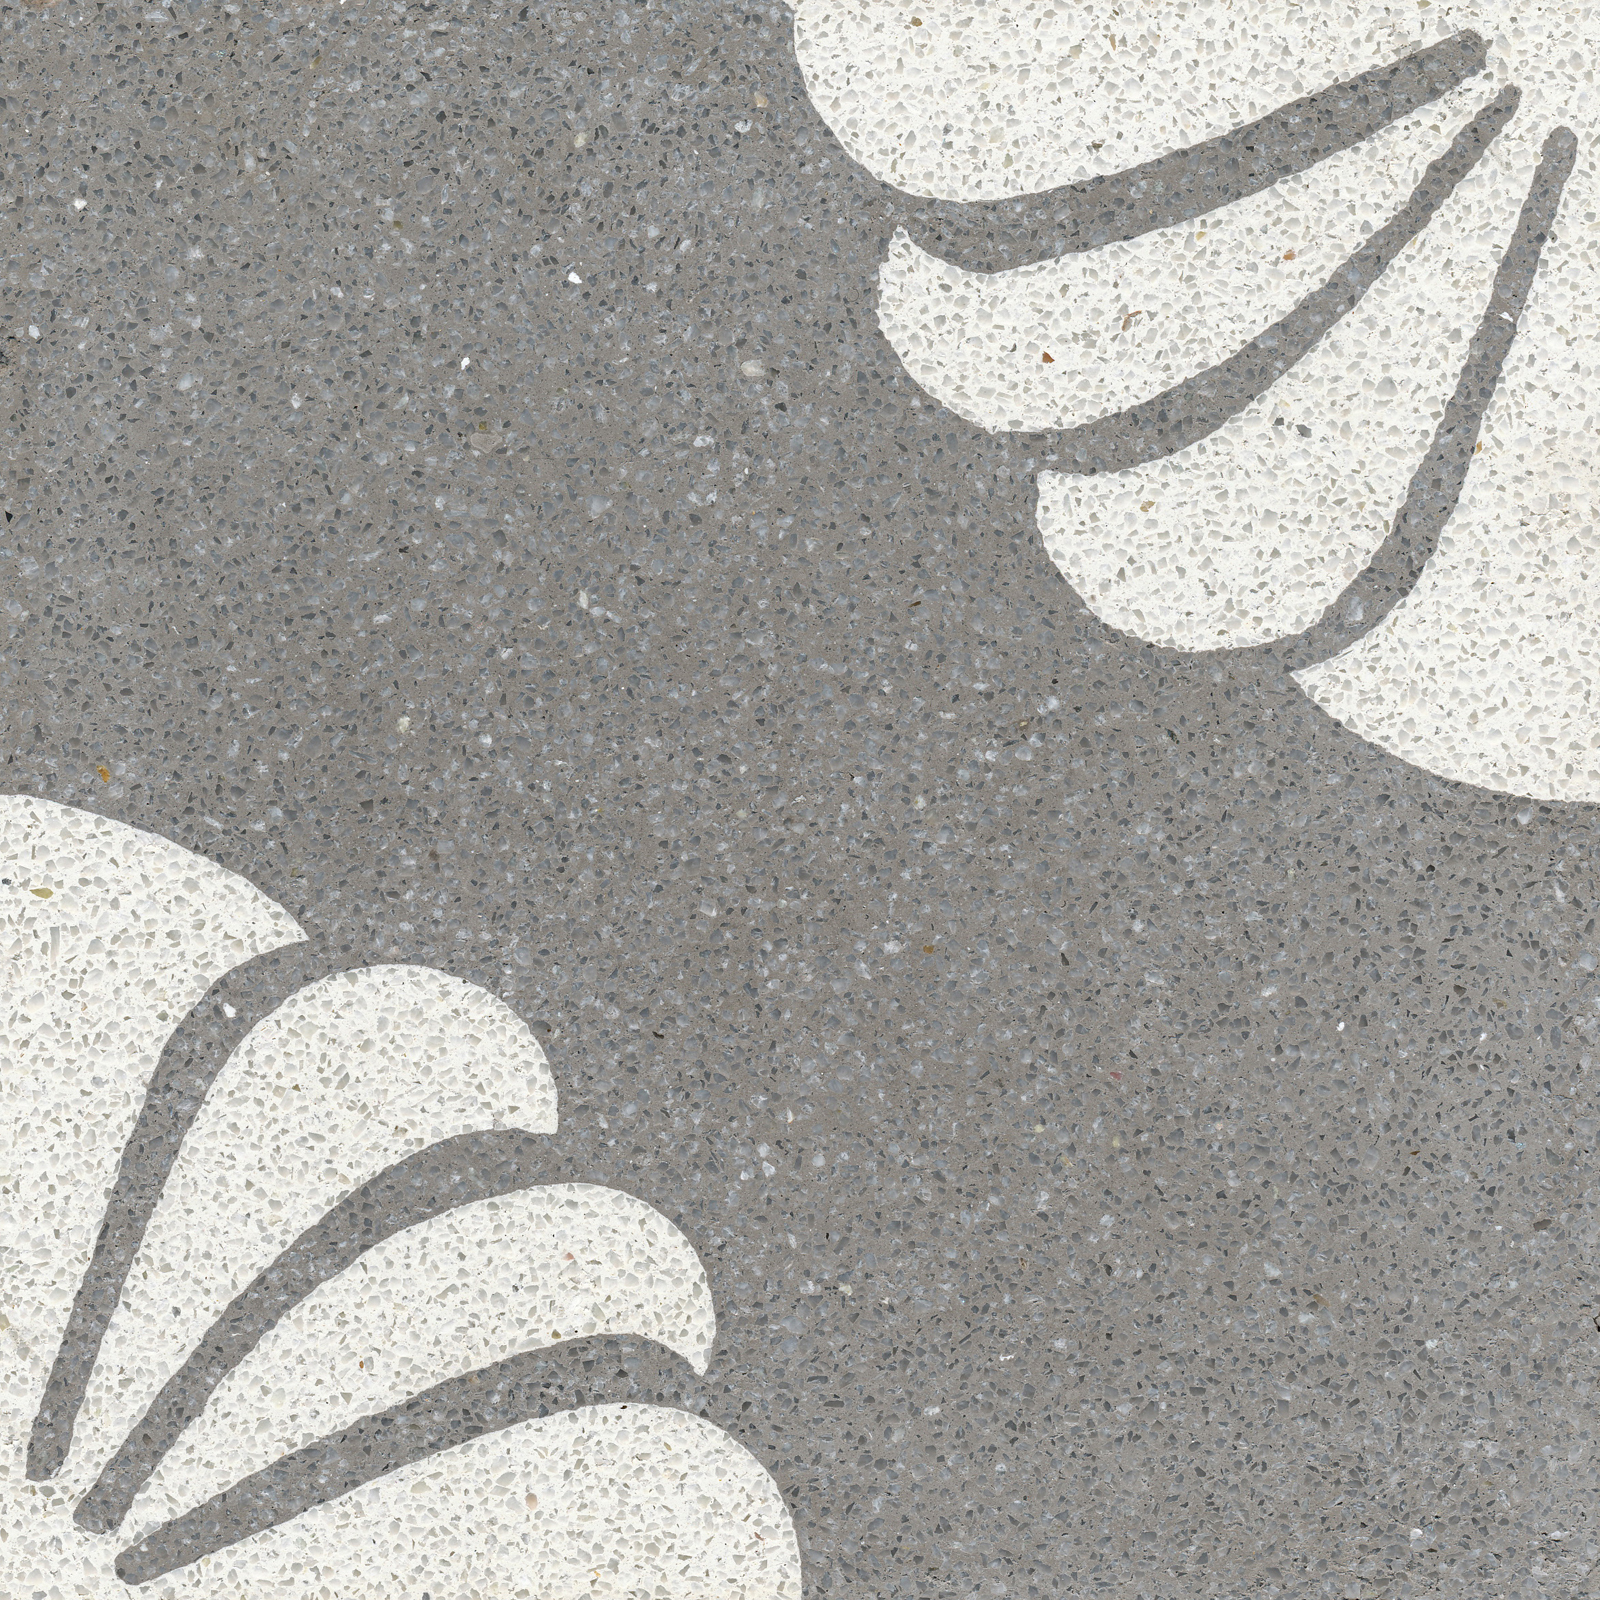 VIA Terrazzofliese florales Muster  in grau und weiß